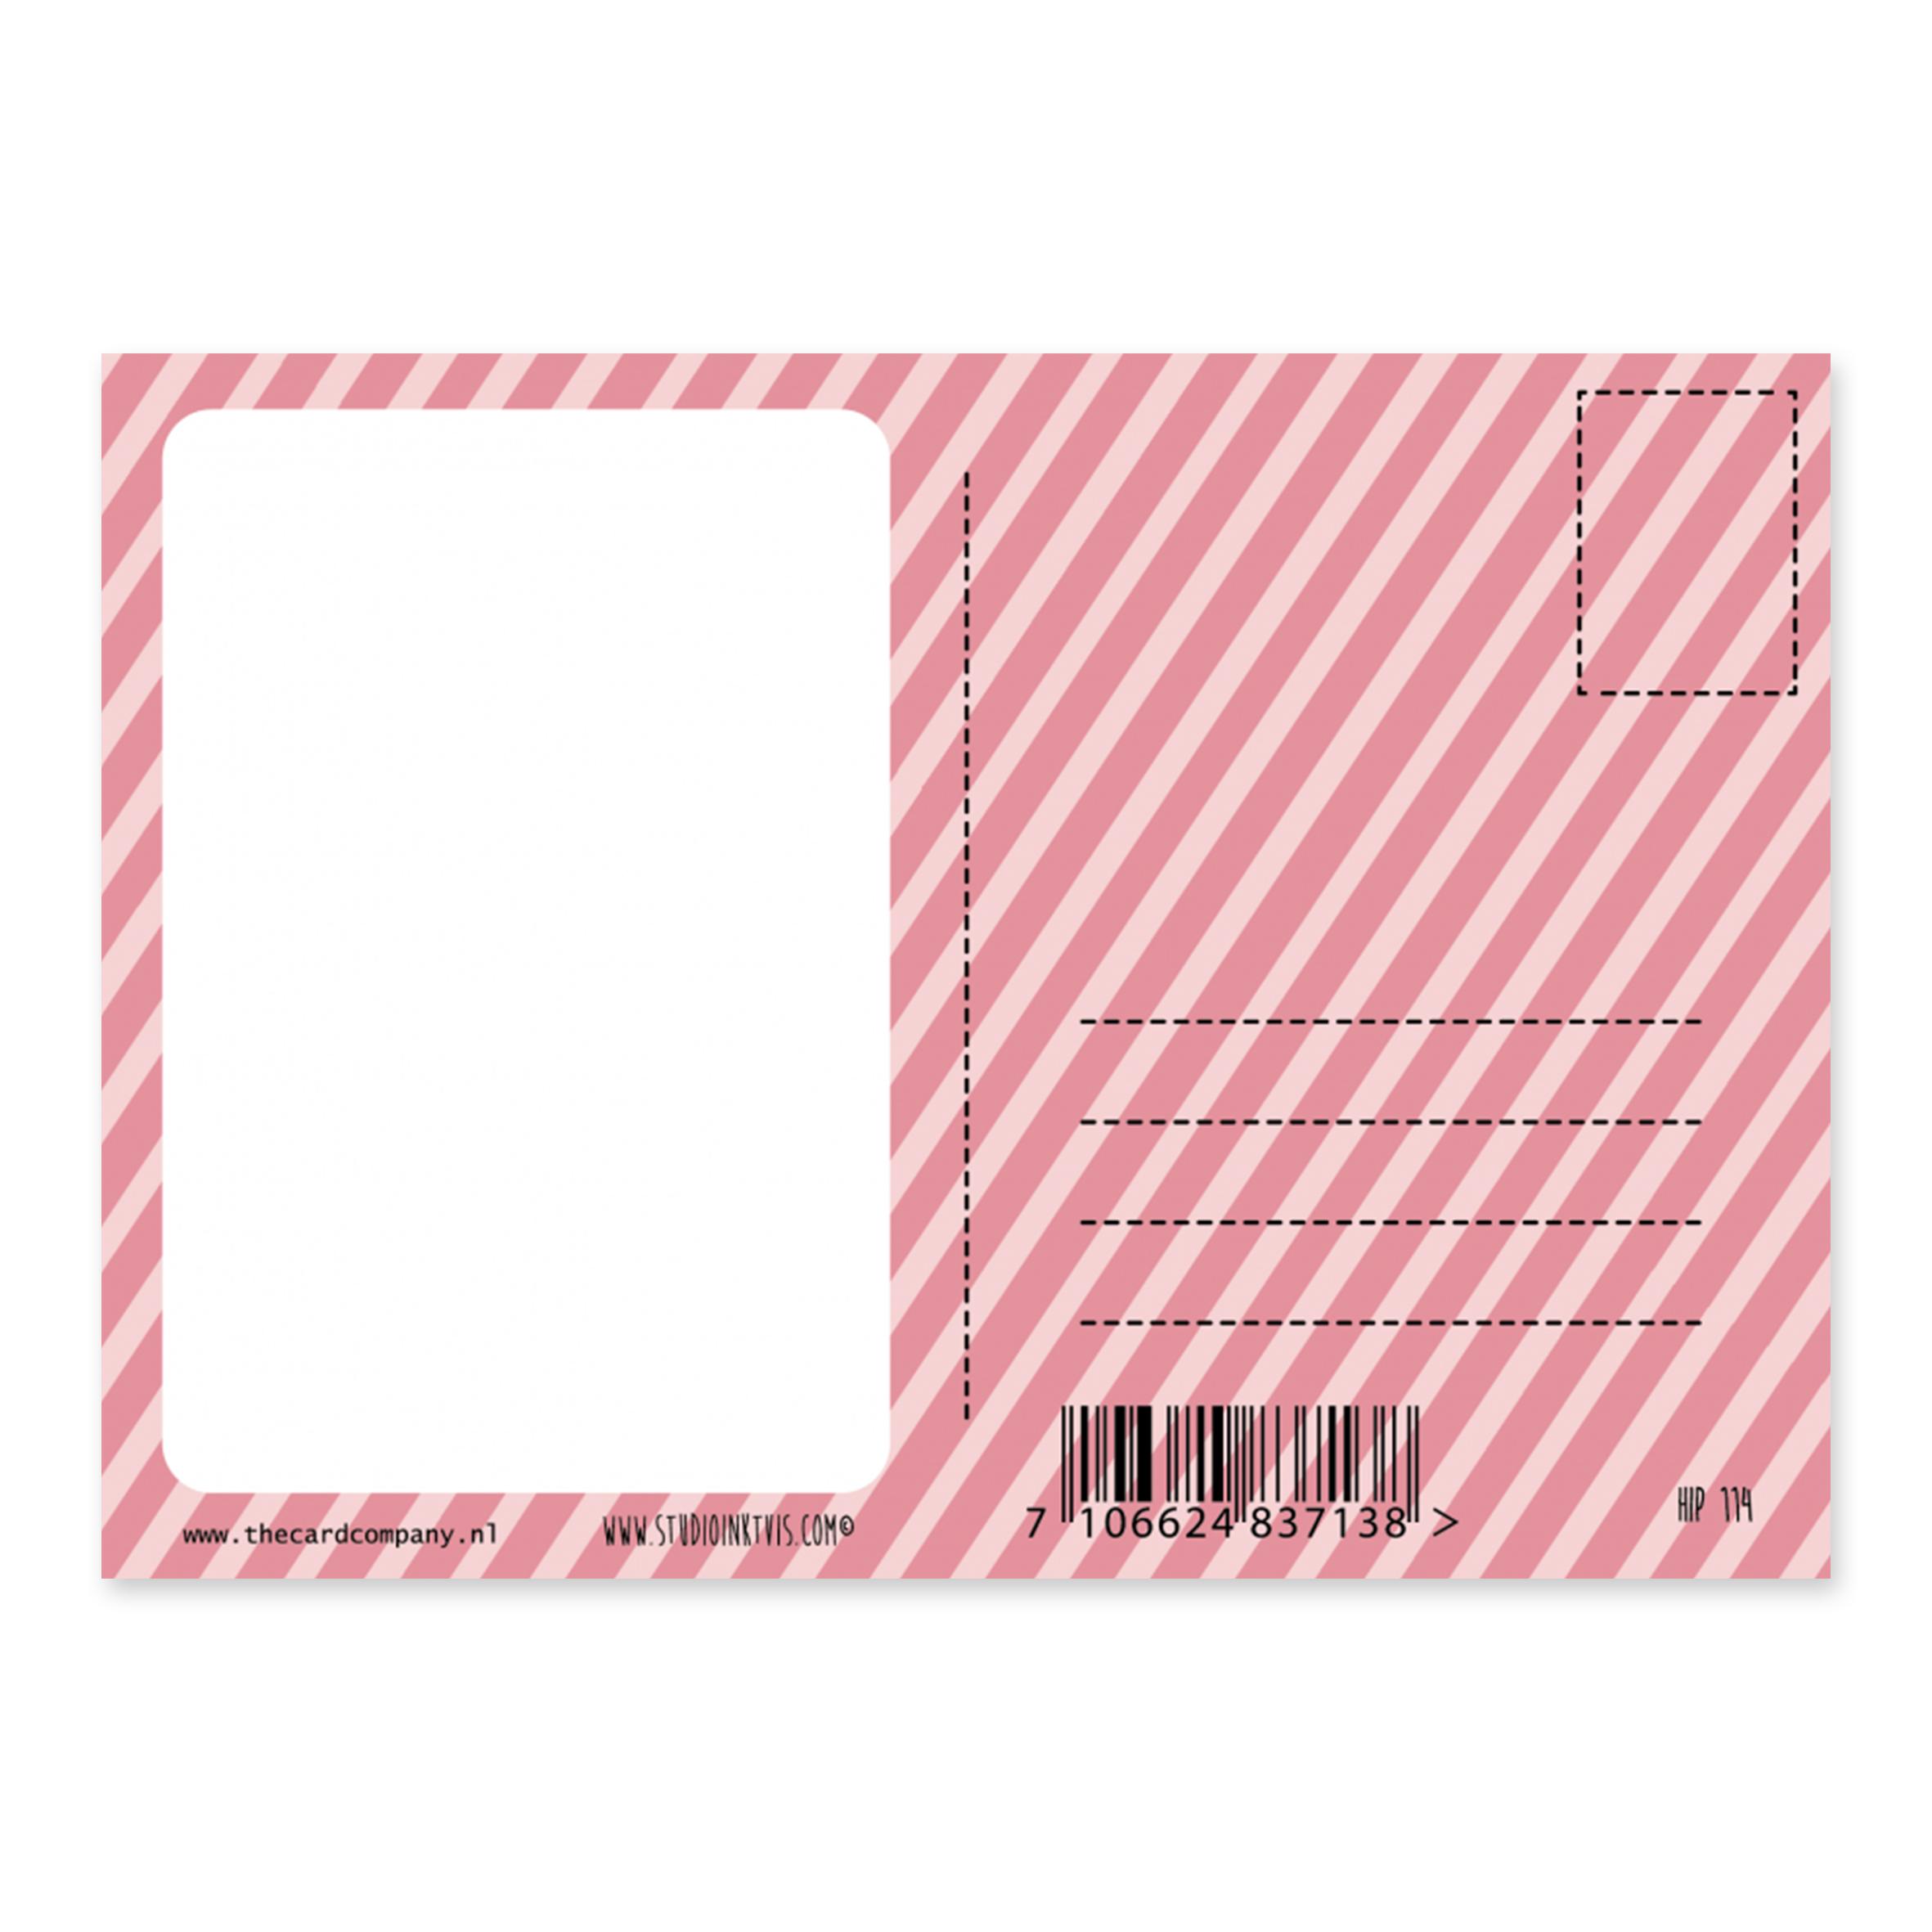 studioinktvis-kaart-ihateeveryoneexceptyou-achterkant